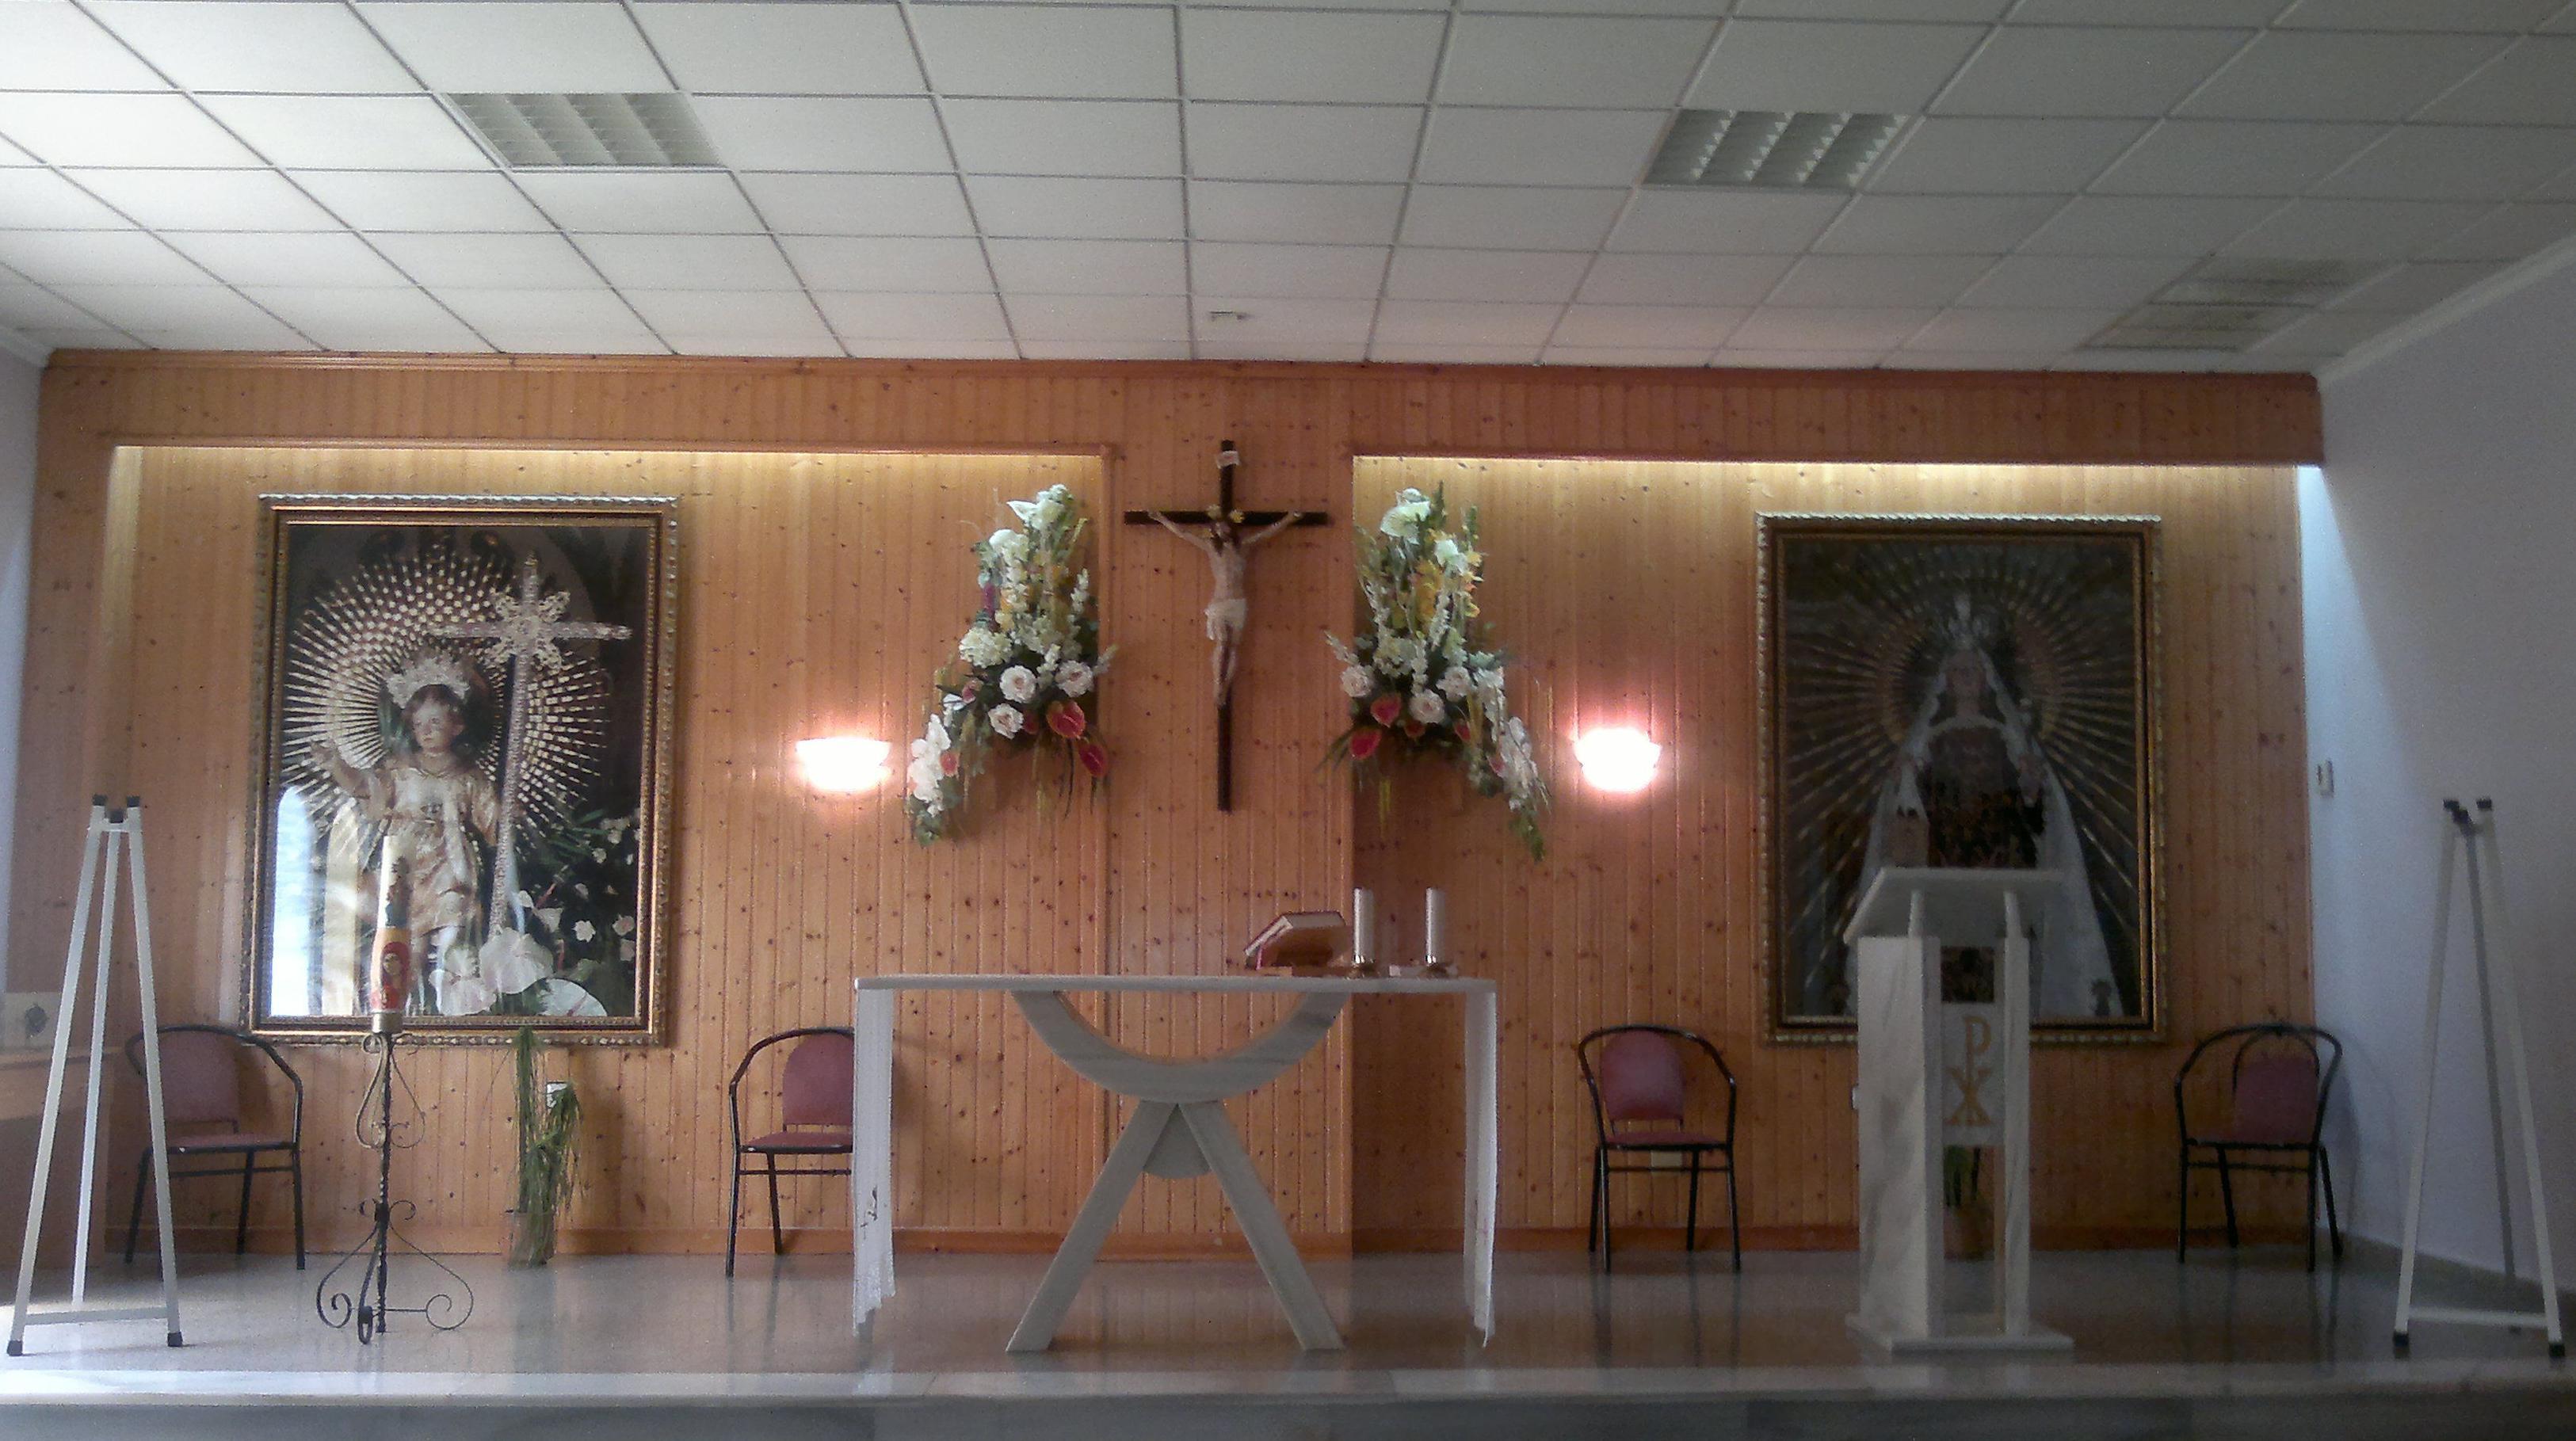 Foto 6 de Funerarias en Mula | Funeraria Tanatorio Santo Domingo, S.L.